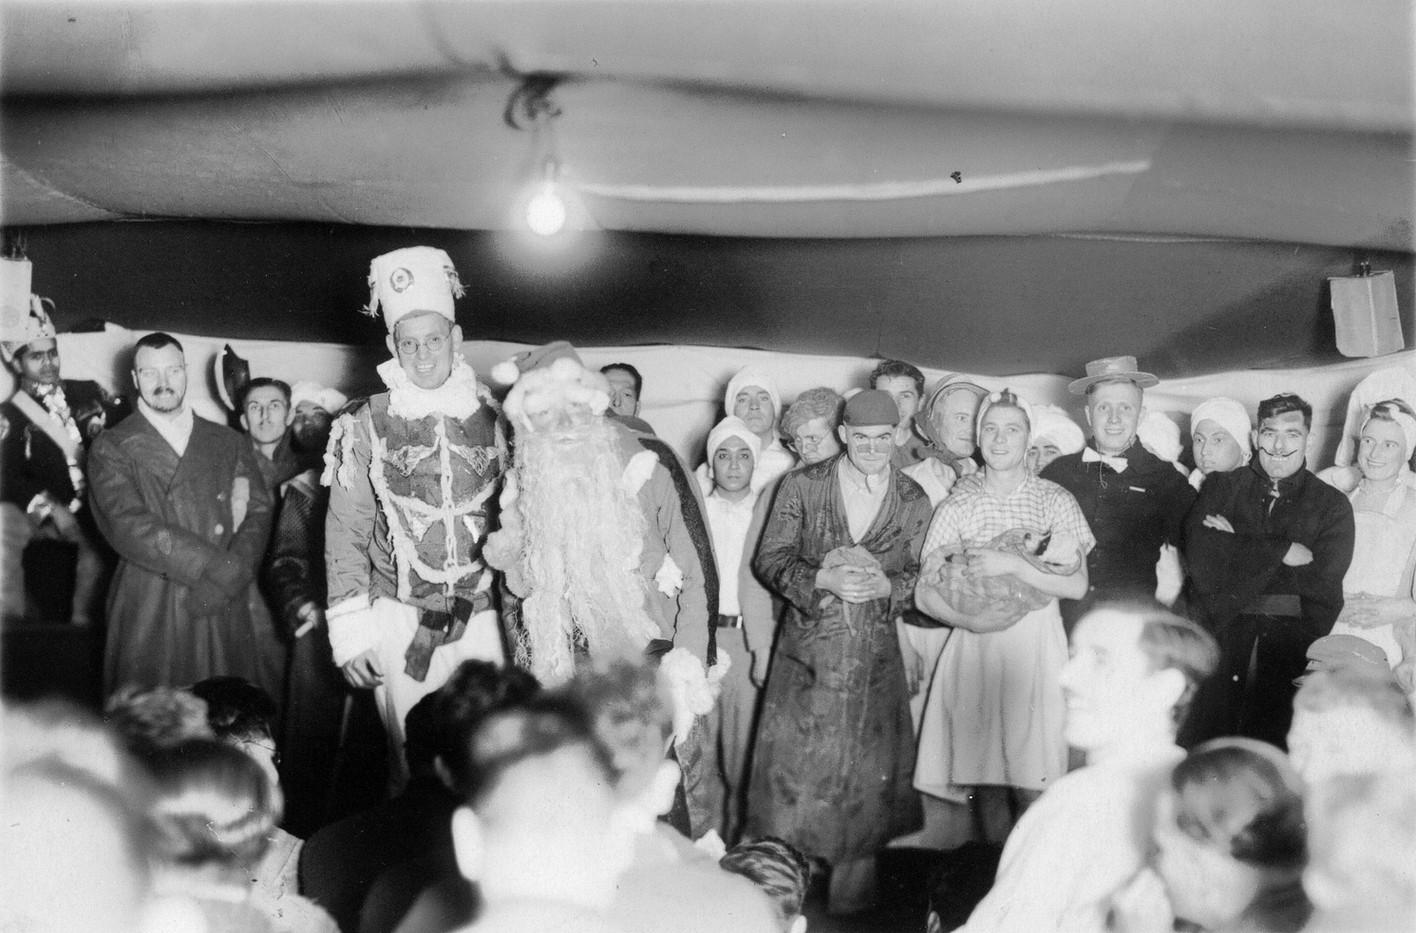 Christmas Concert 1, Muroran 1944